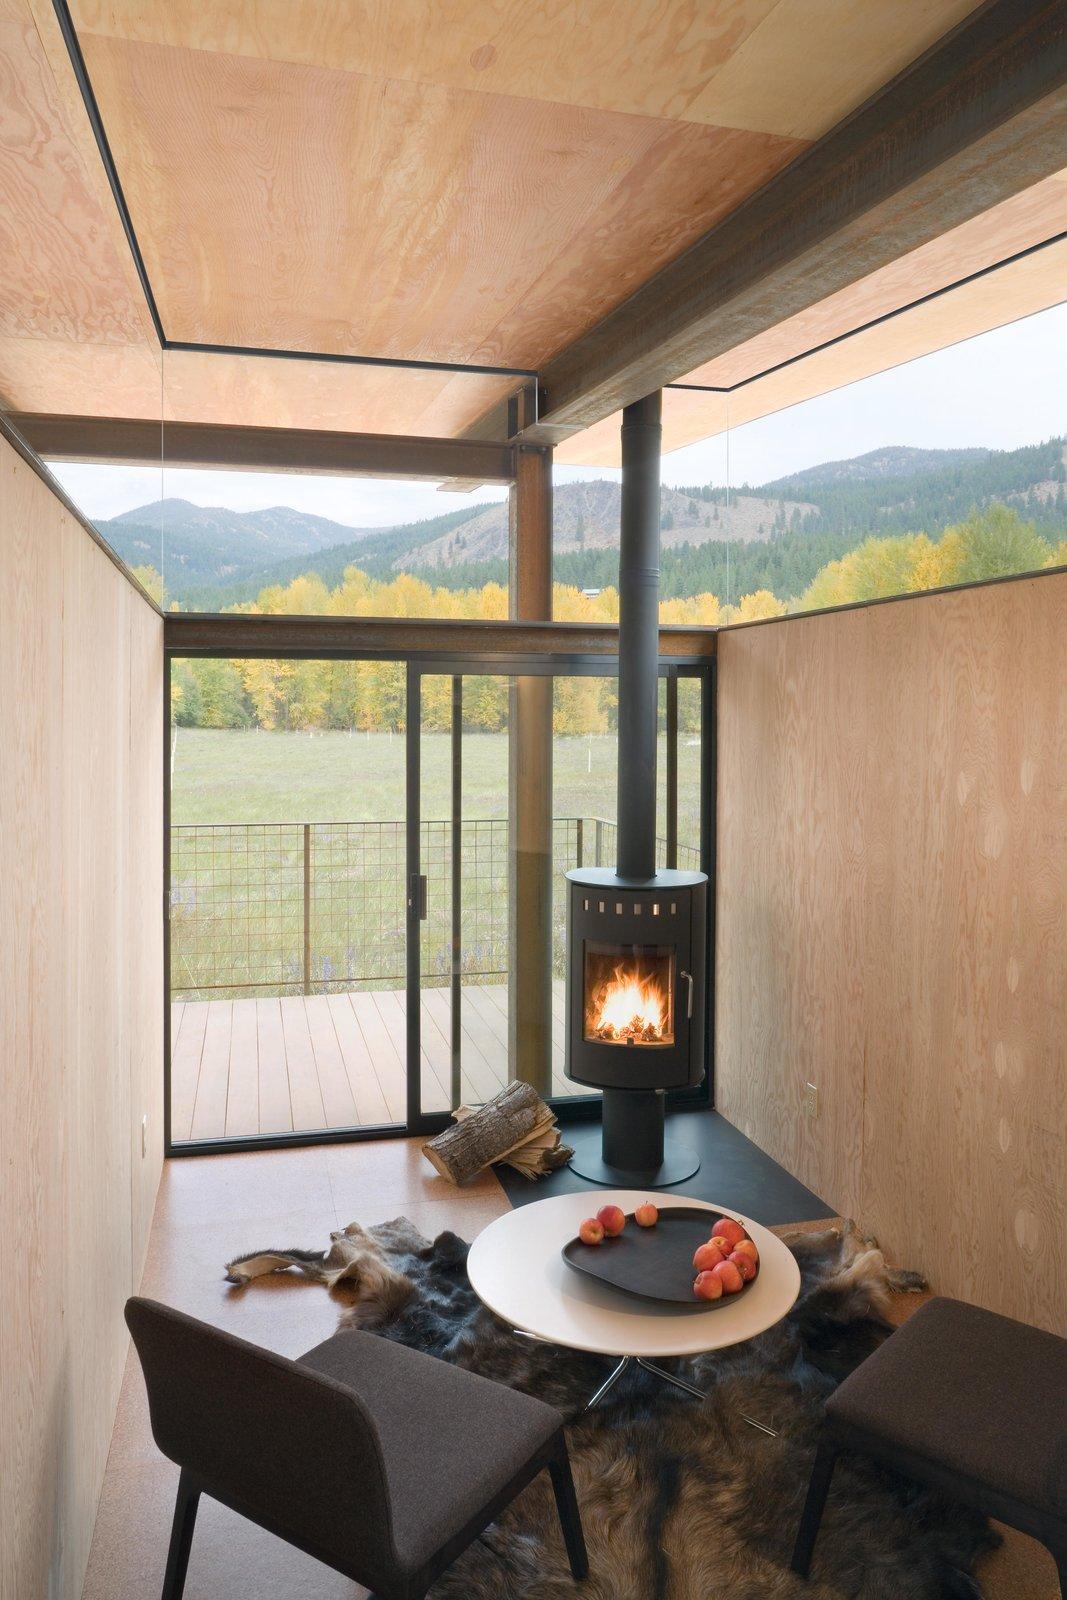 Living Room Rolling Huts   Olson Kundig  Rolling Huts by Olson Kundig